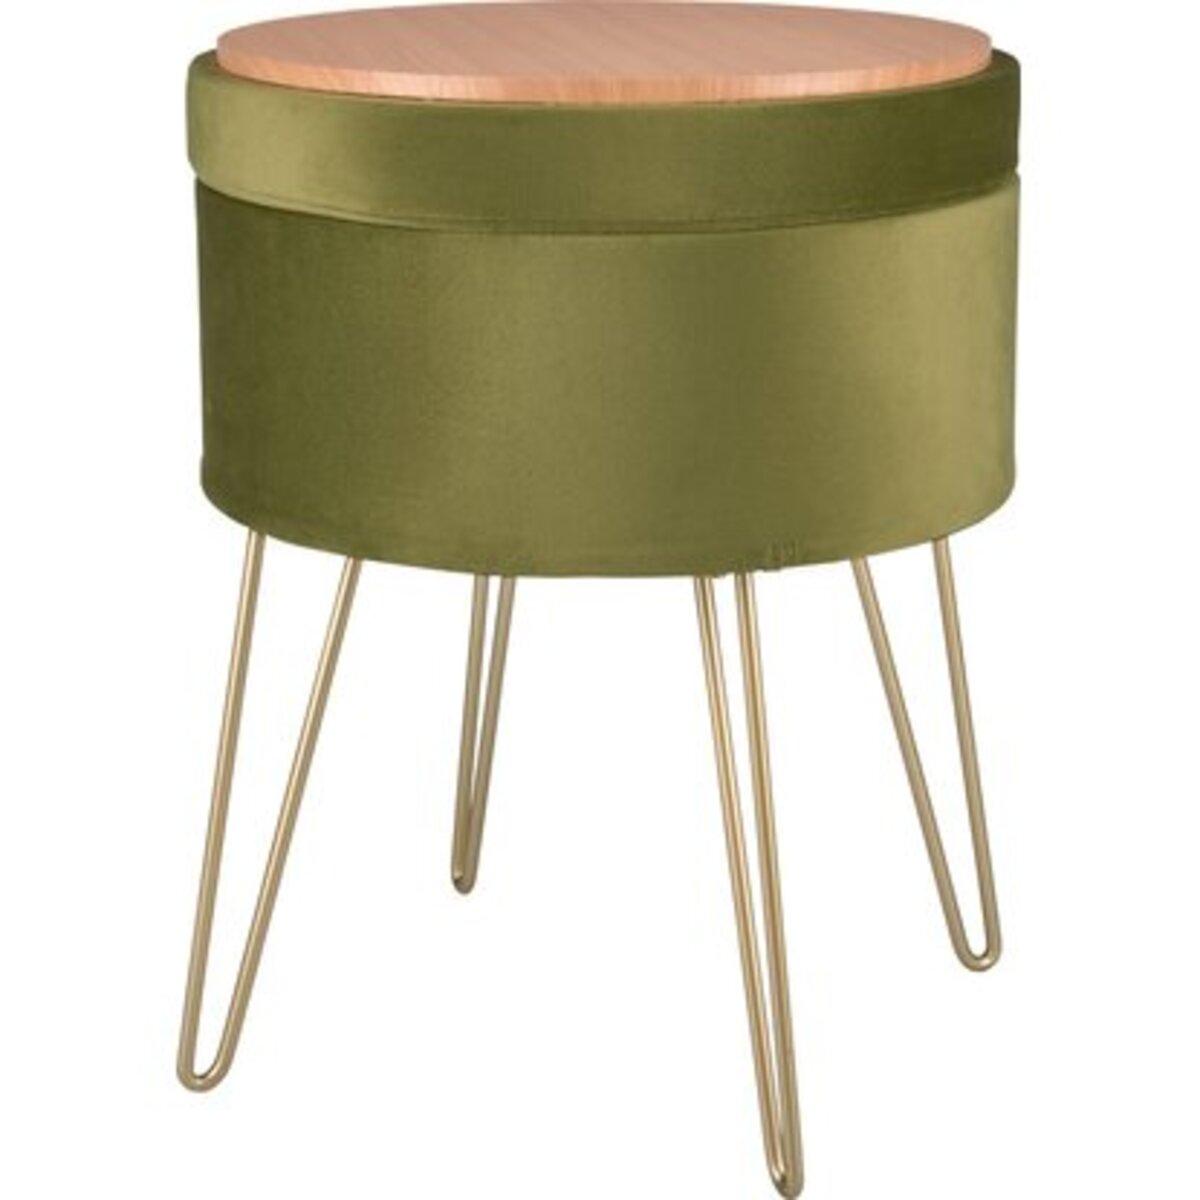 Bild 2 von Sitzhocker Safari Lodge MDF 45 cm x Ø 36 cm Grün